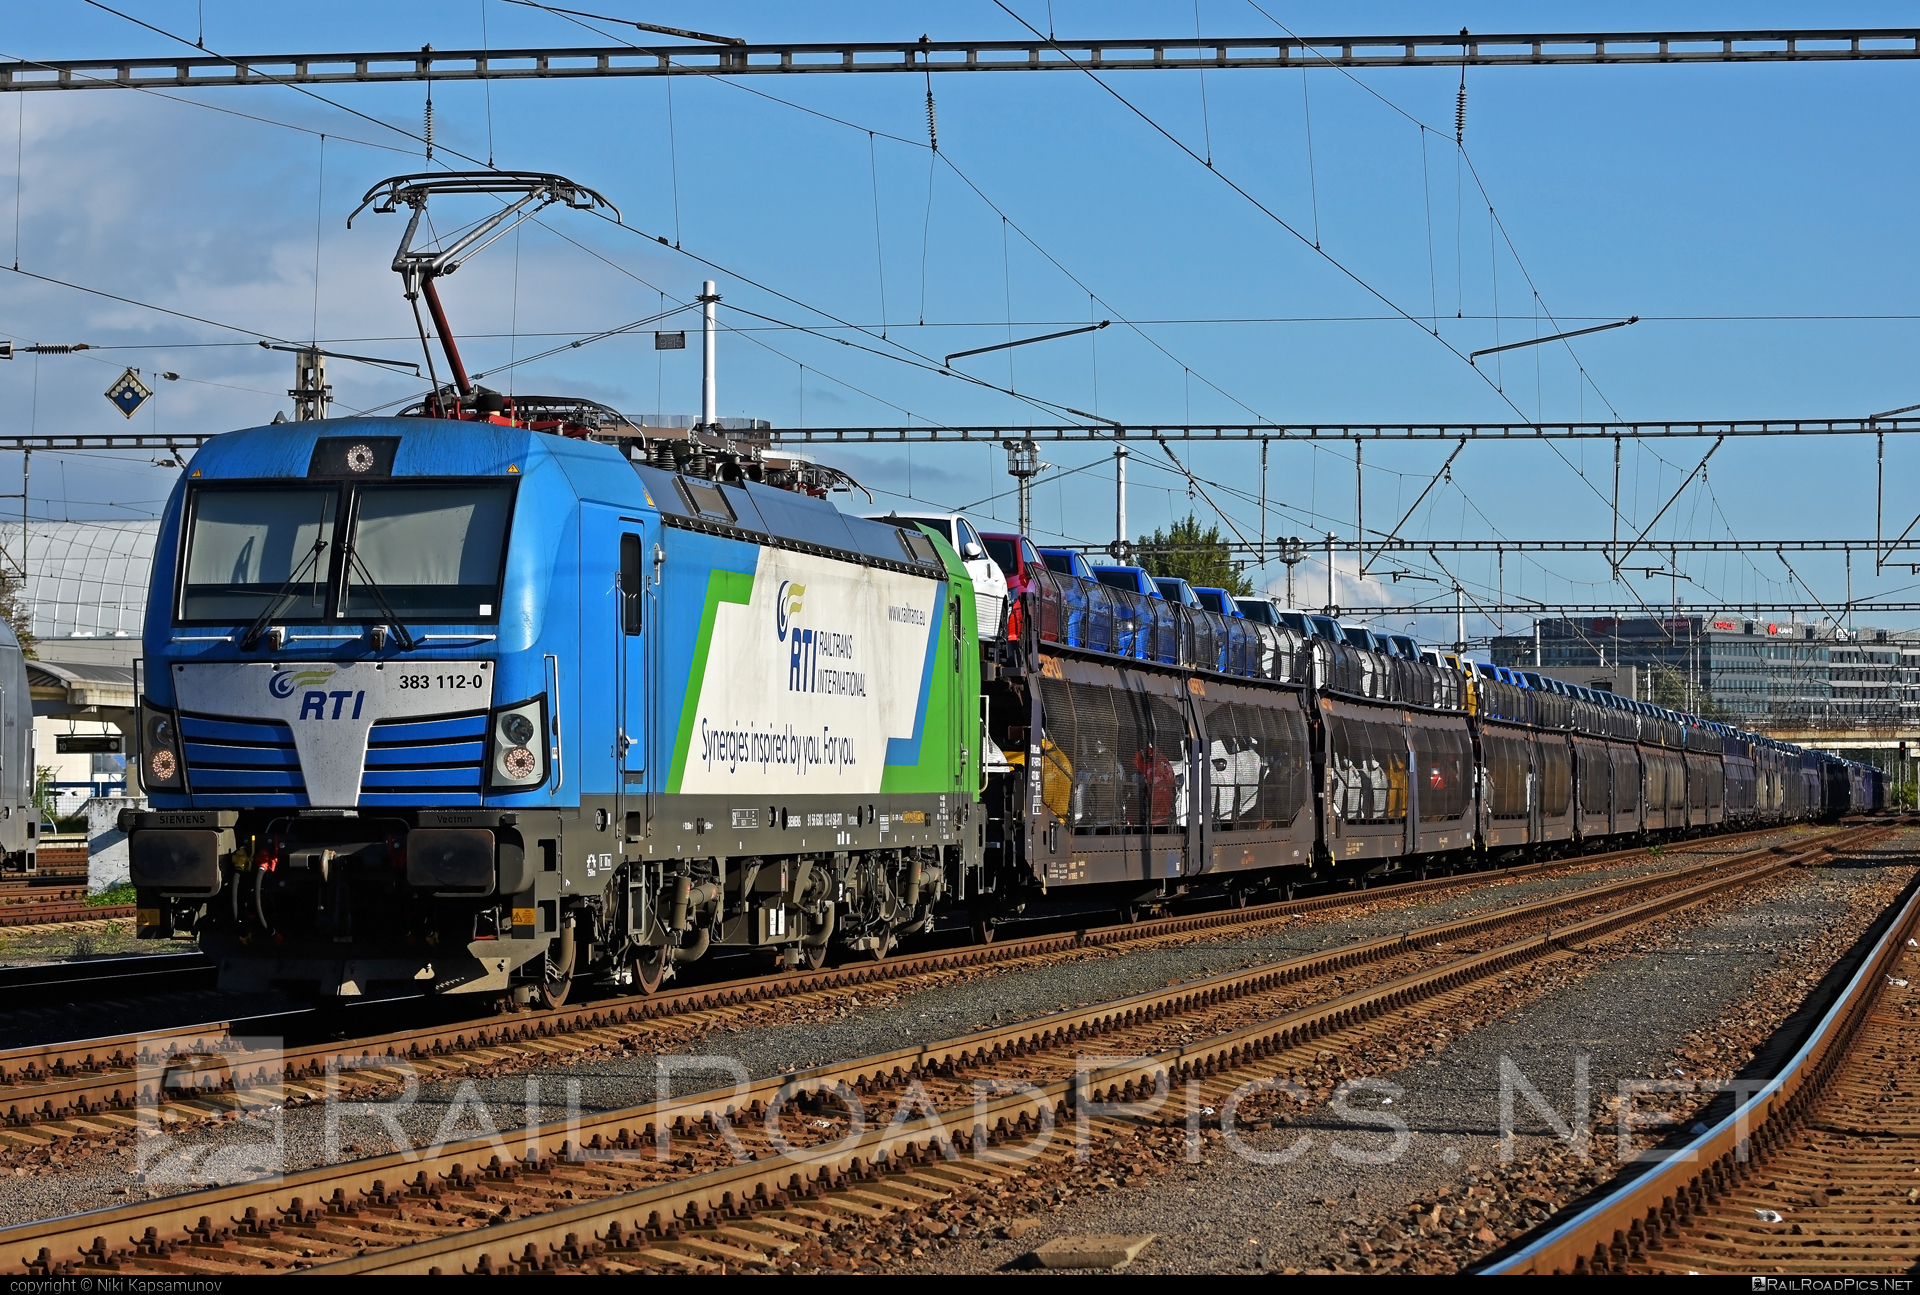 Siemens Vectron MS - 383 112-0 operated by Railtrans International, s.r.o #carcarrierwagon #gefco #rti #siemens #siemensvectron #siemensvectronms #vectron #vectronms